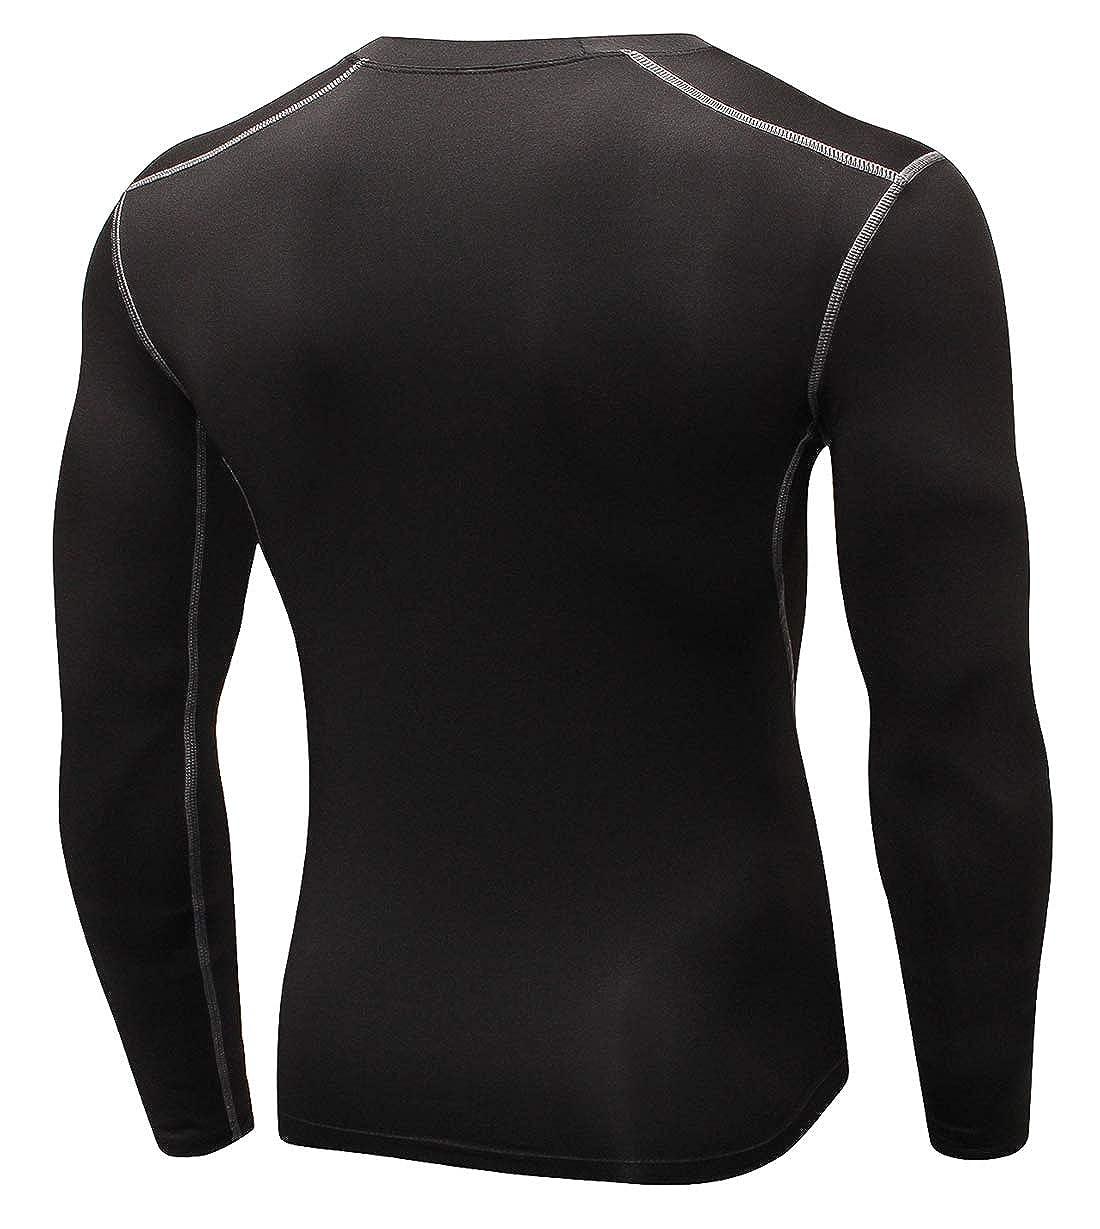 6e9b2530b Diyo Men's Base Layer Tops Long Sleeve Wicking Crew Neck Shirts